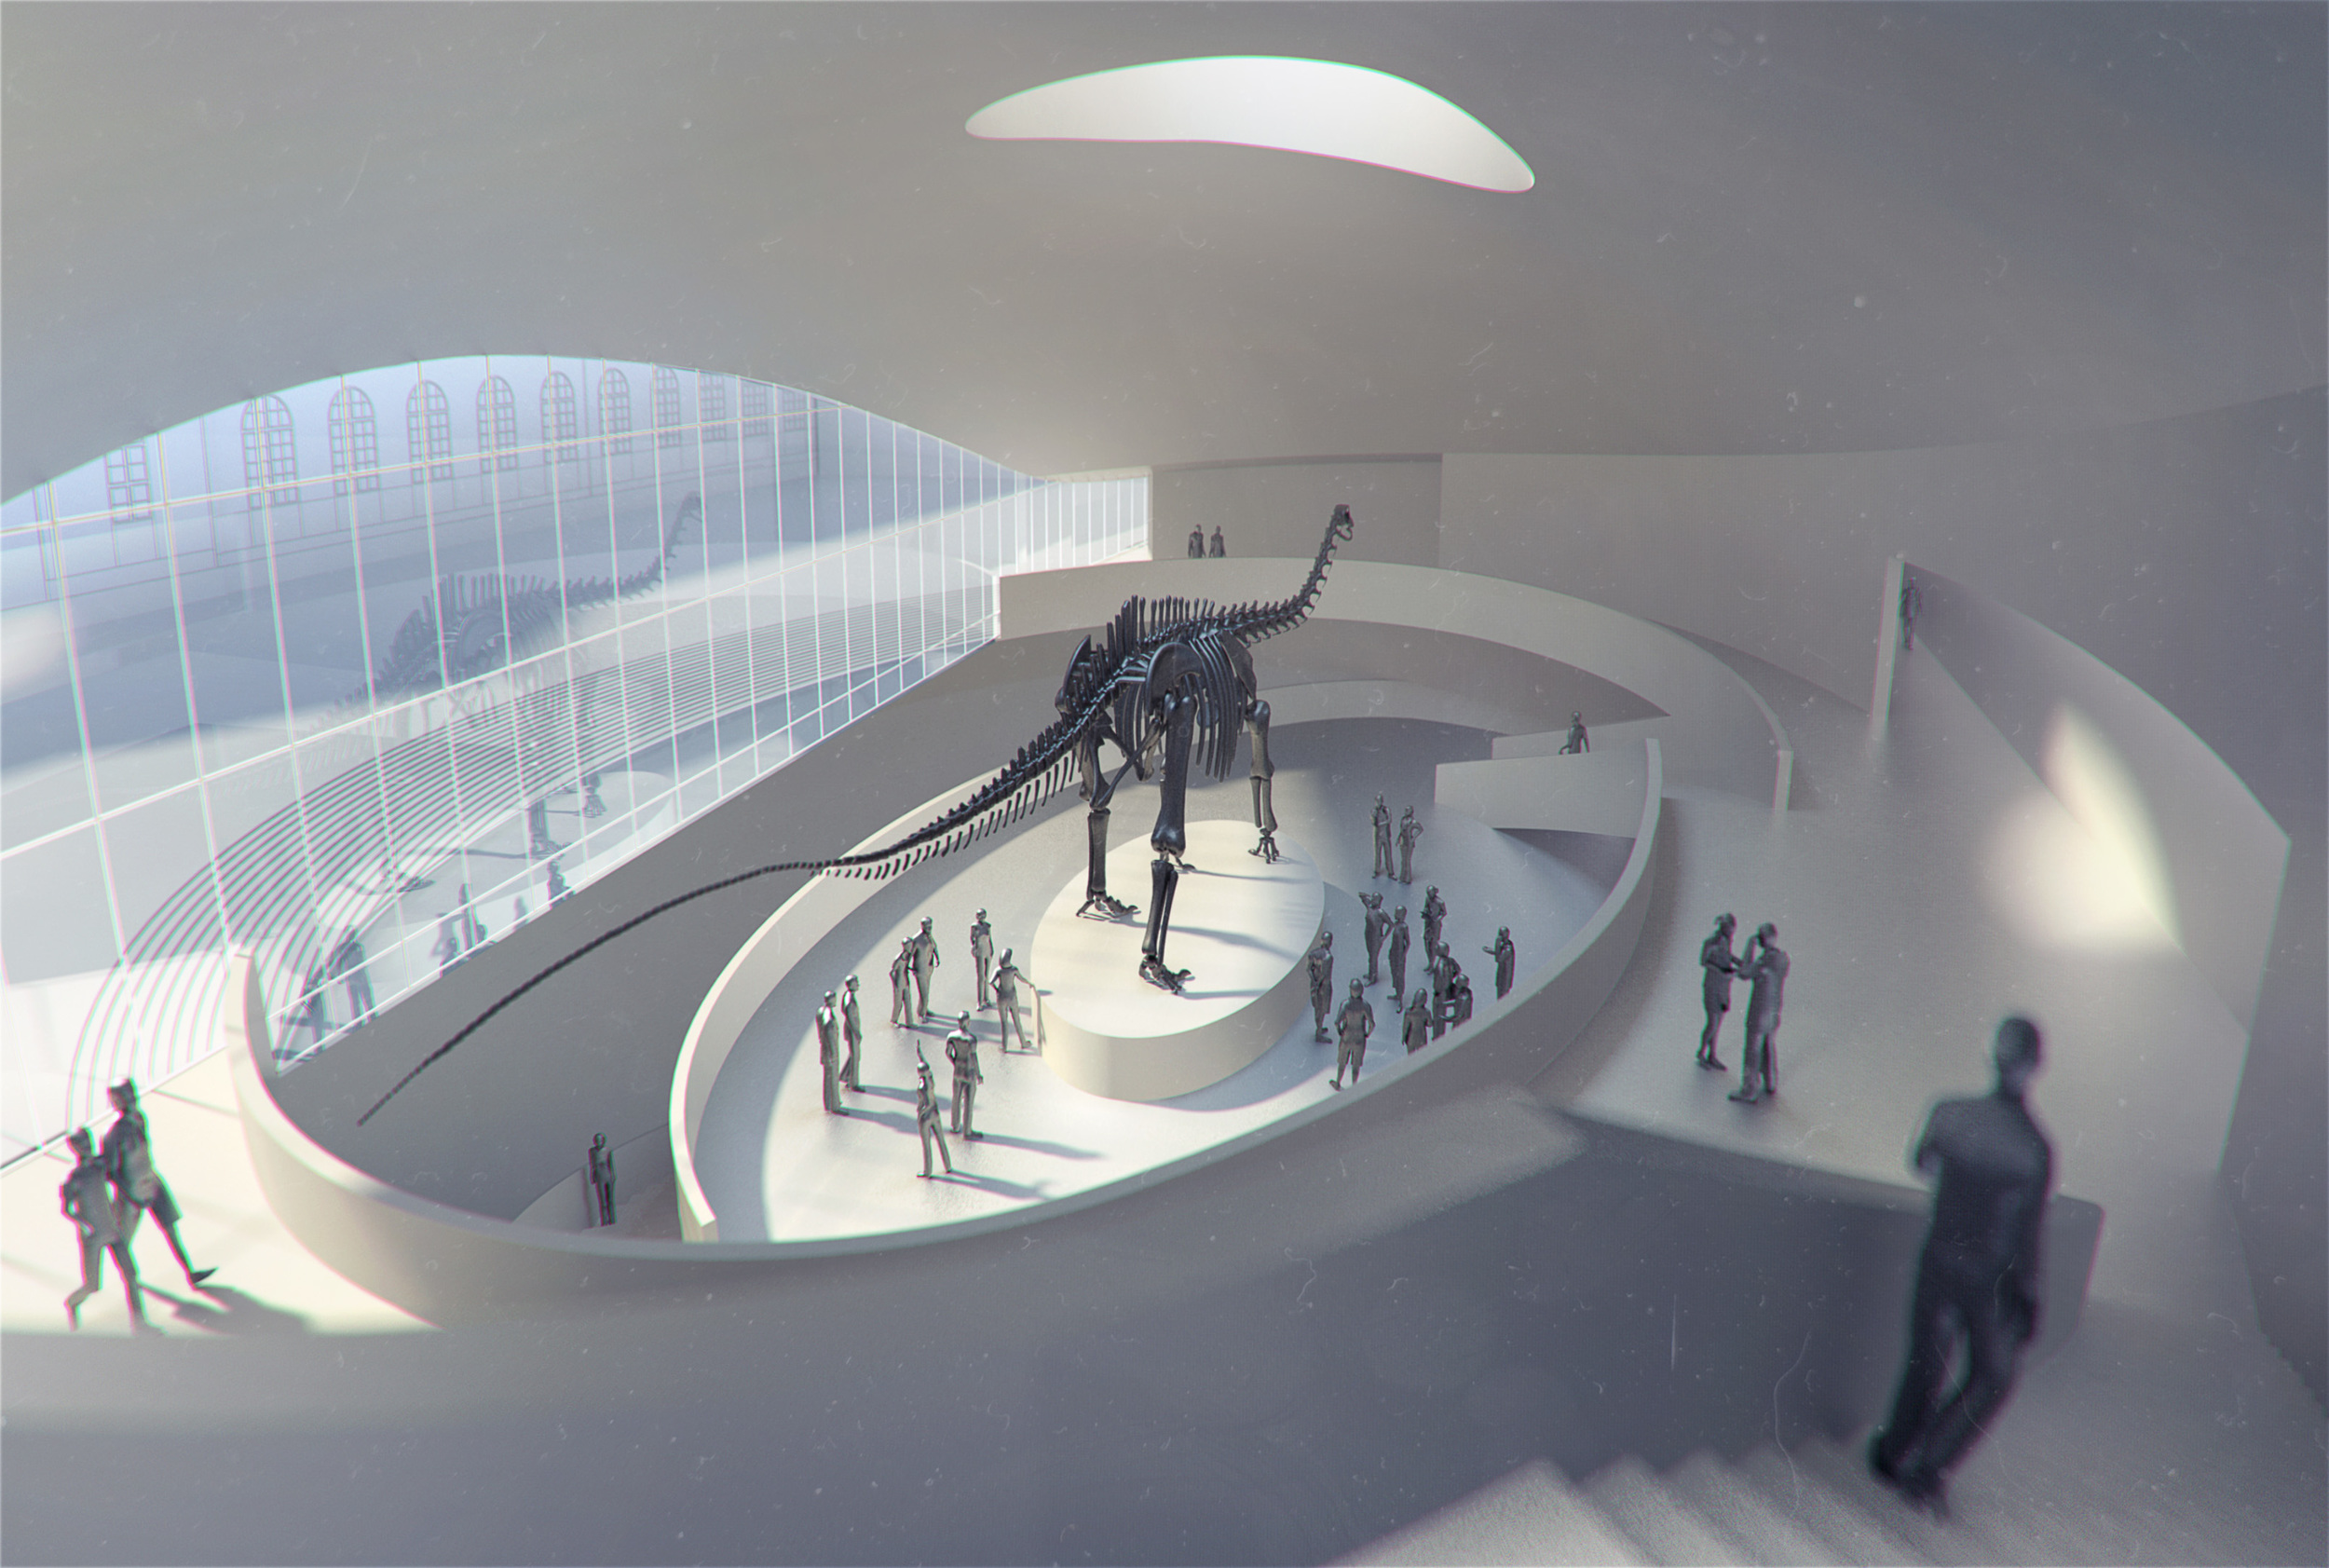 BAVARIA MUSEUM OF NATURAL HISTORY  Munich, Germany | Image courtesy of wöhr heugenhauser architekten